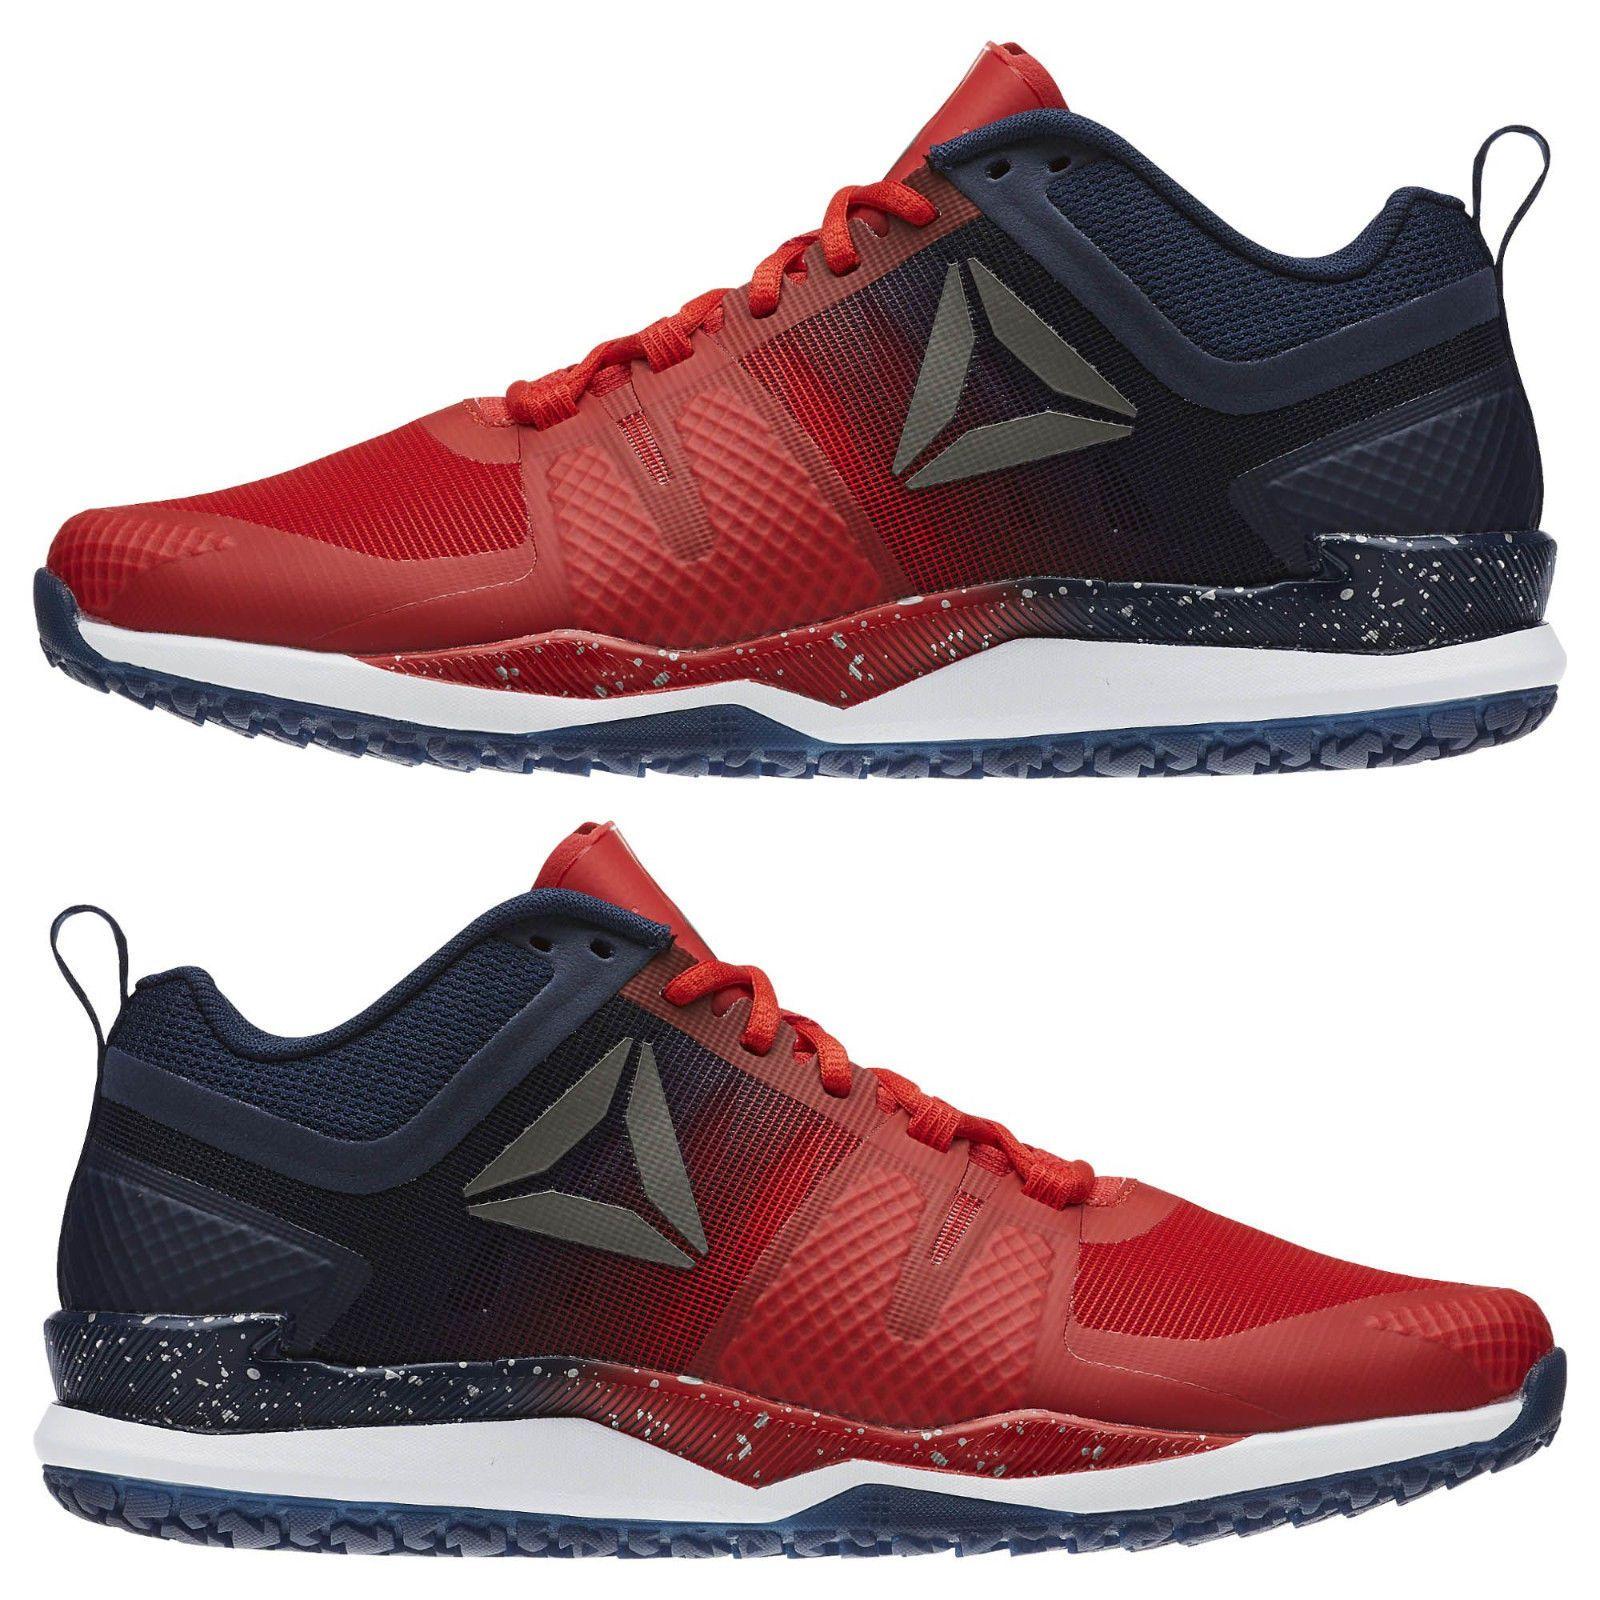 405dbd635b8 Men s Reebok JJ Watt I City Edition pack 1 training crossfit trainer TR Jj  Watt Shoes